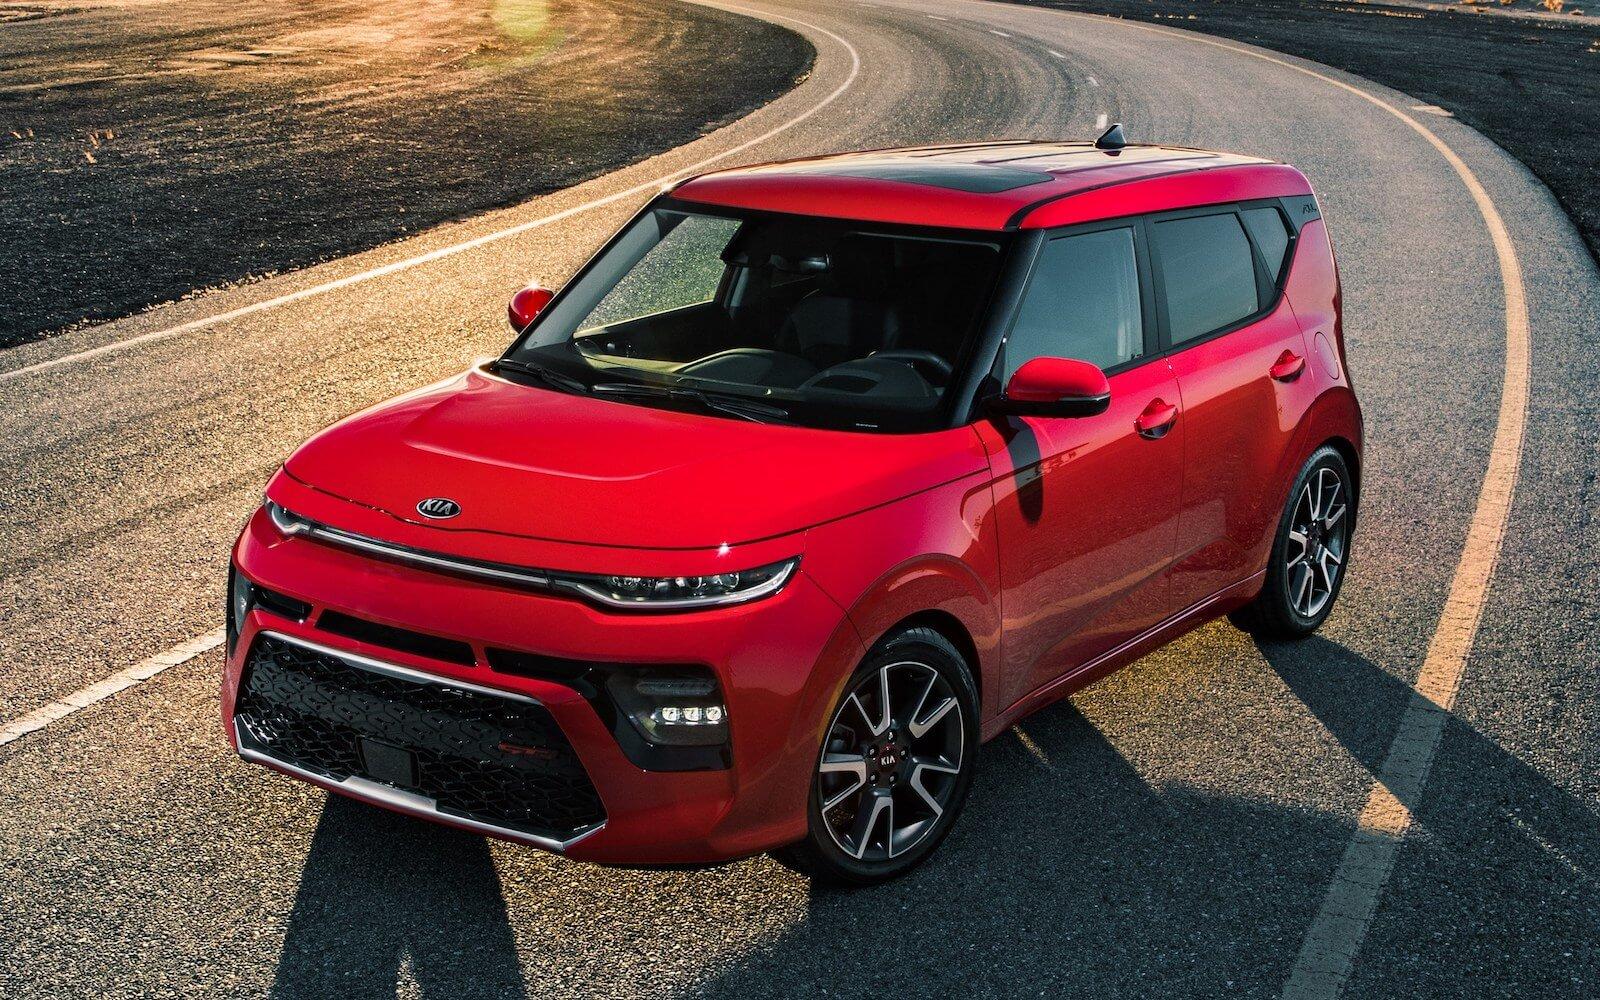 Kia Soul Ev A Fun Route Into The Electric Car World Read Our Review